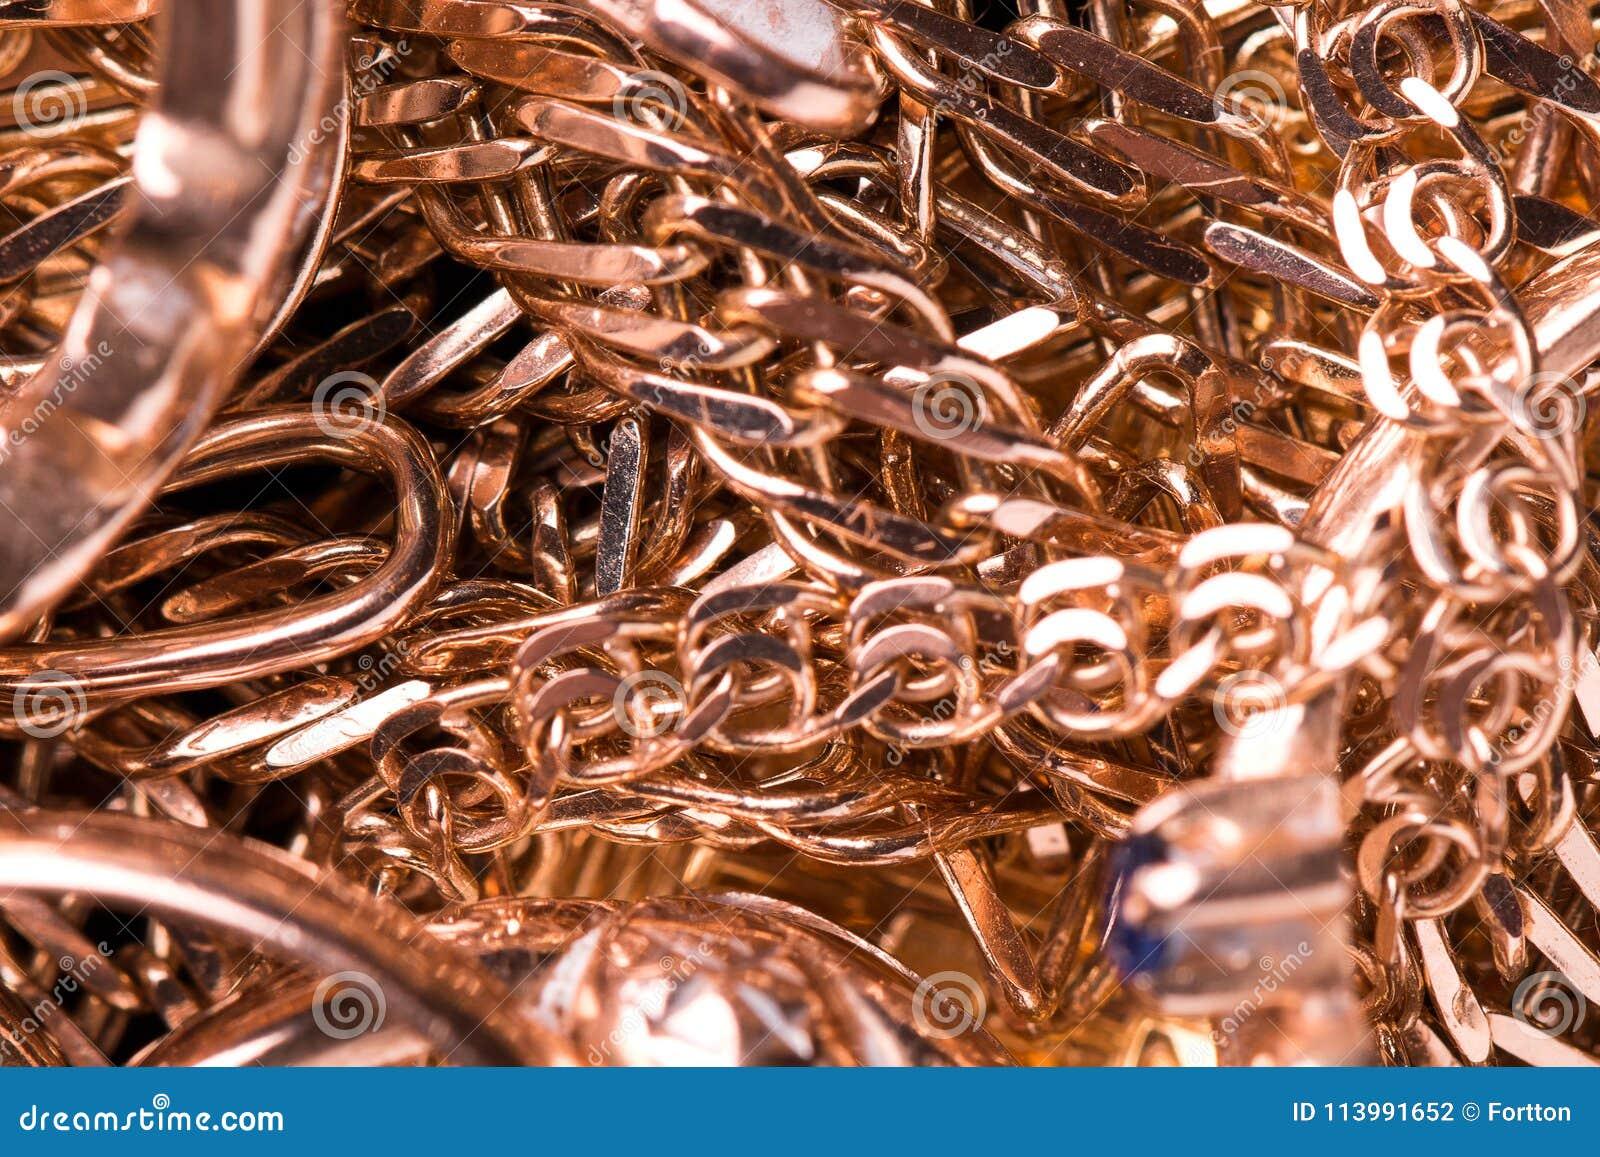 Gold jewelry close-up